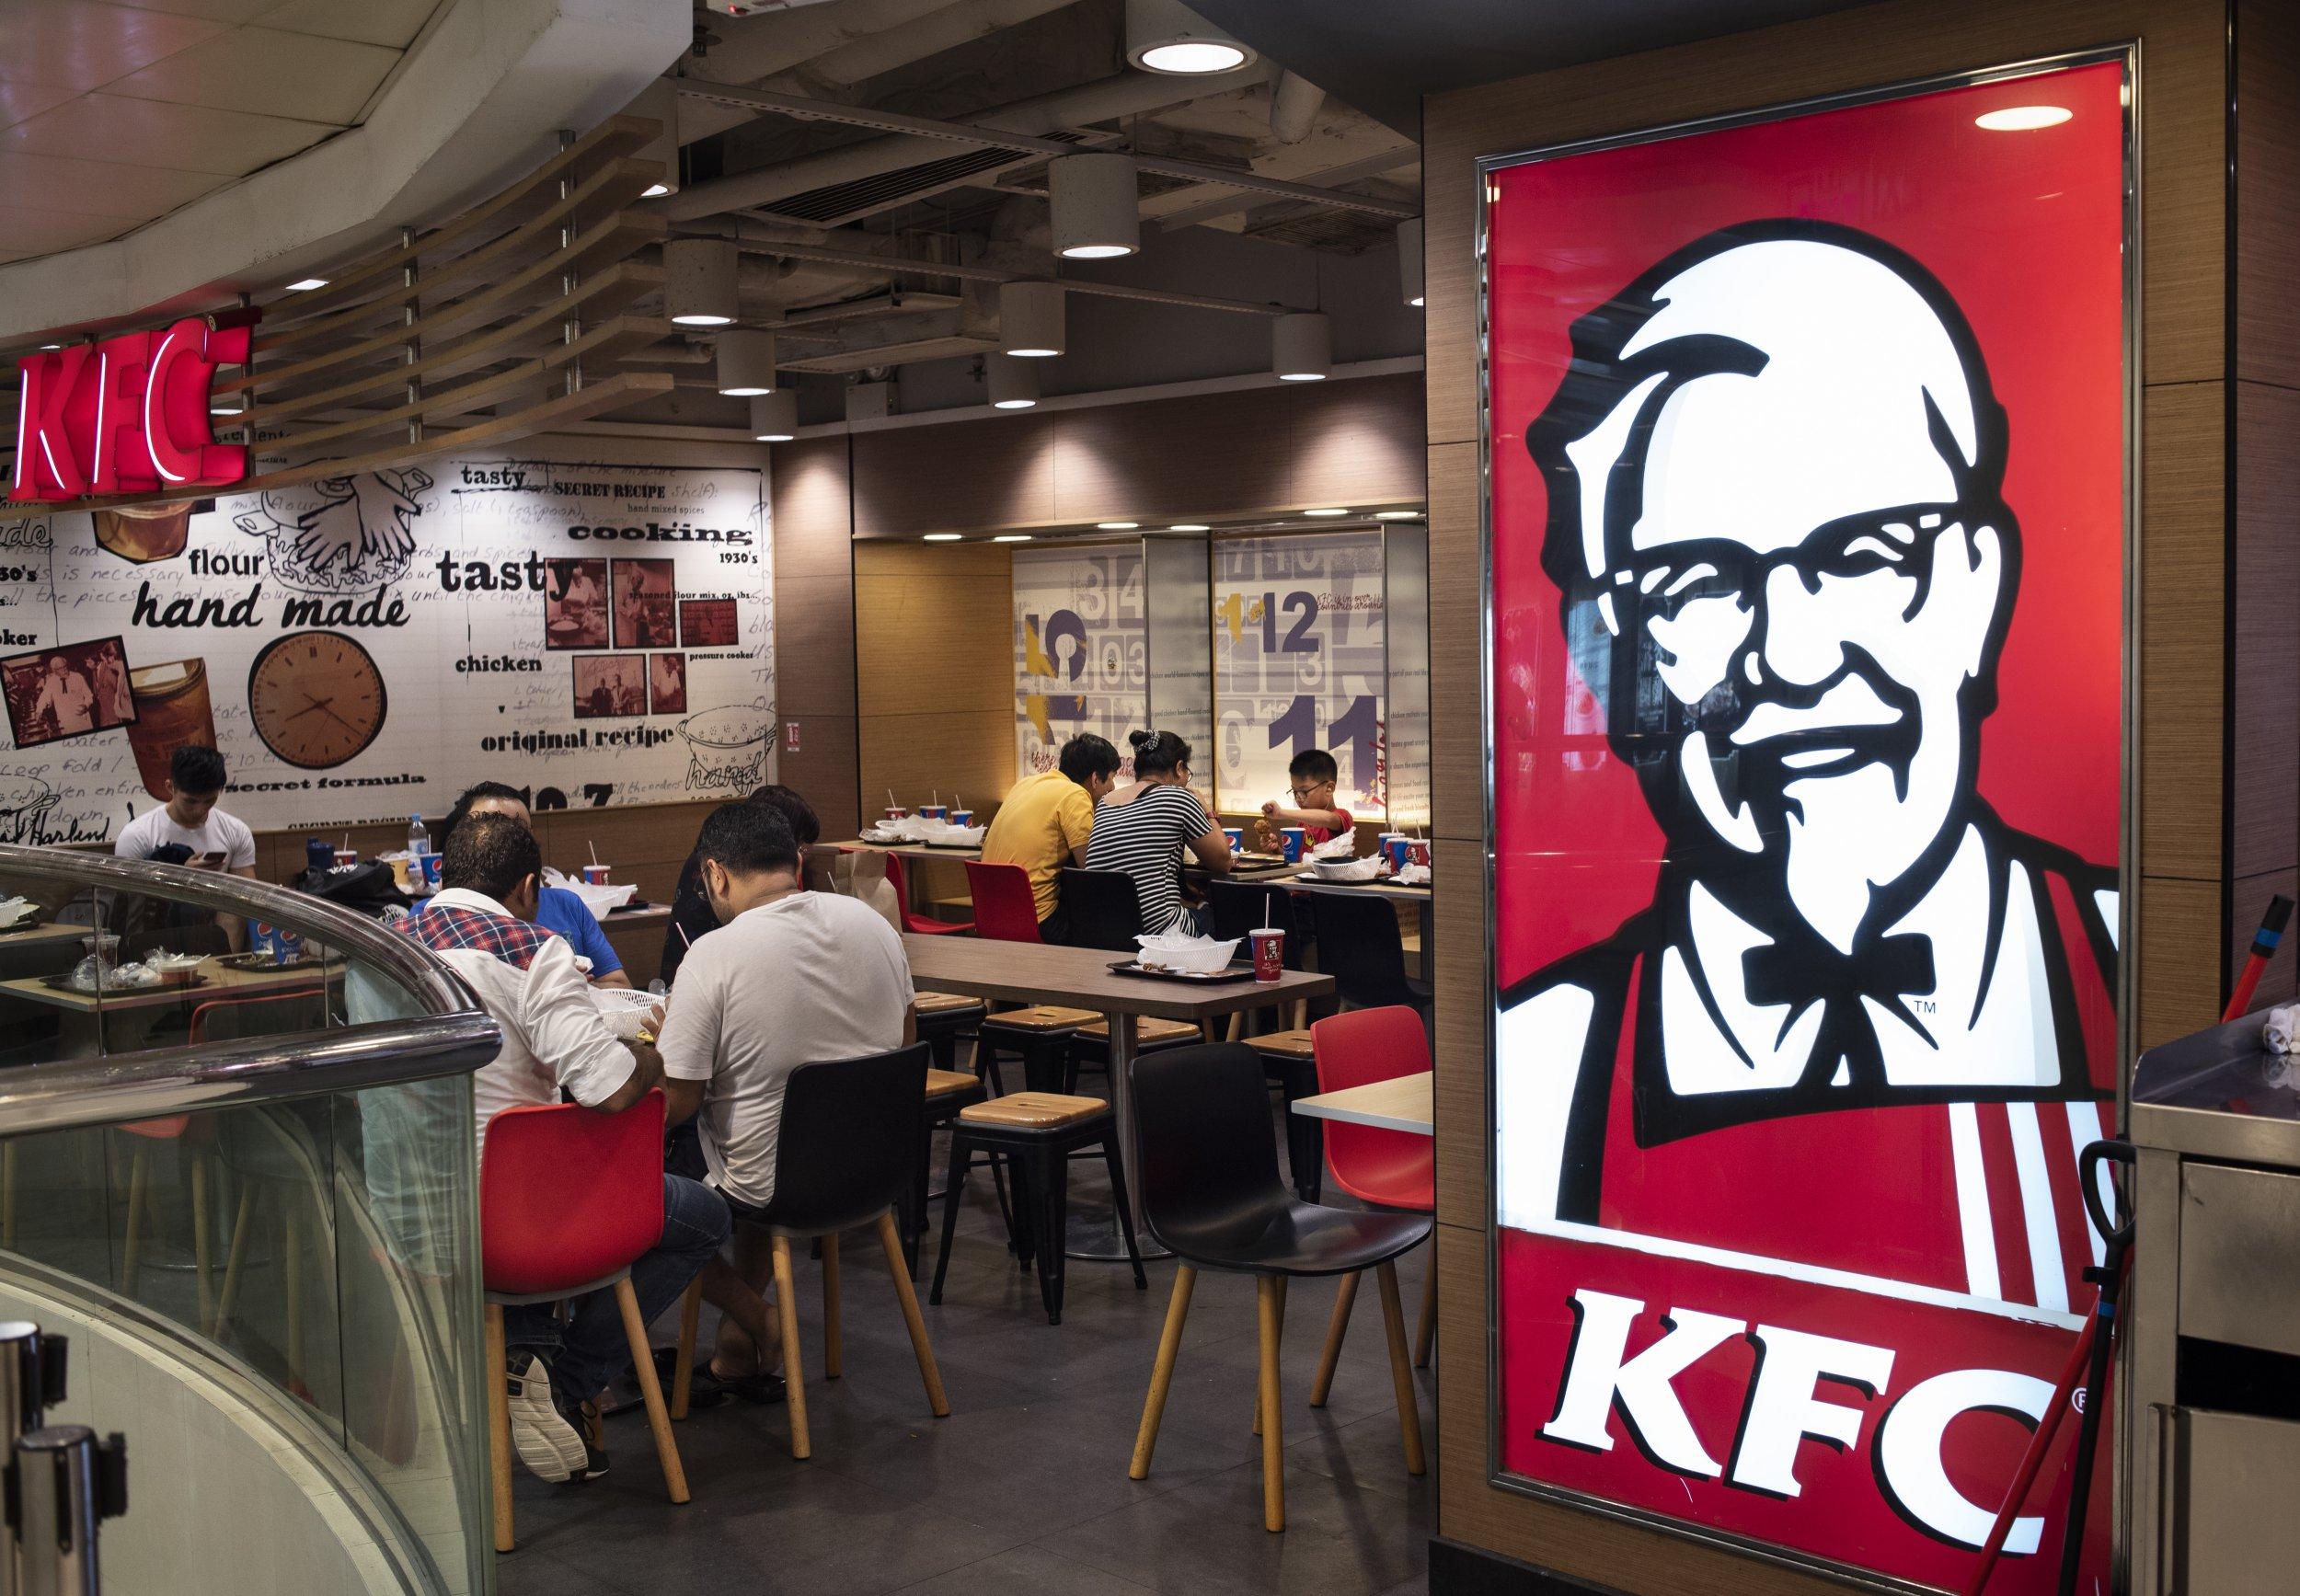 JORDAN, KOWLOON, HONG KONG - 2018/07/06: Kentucky Fried Chicken brand logo and restaurant in Mong Kok, Hong Kong. (Photo by Miguel Candela/SOPA Images/LightRocket via Getty Images)